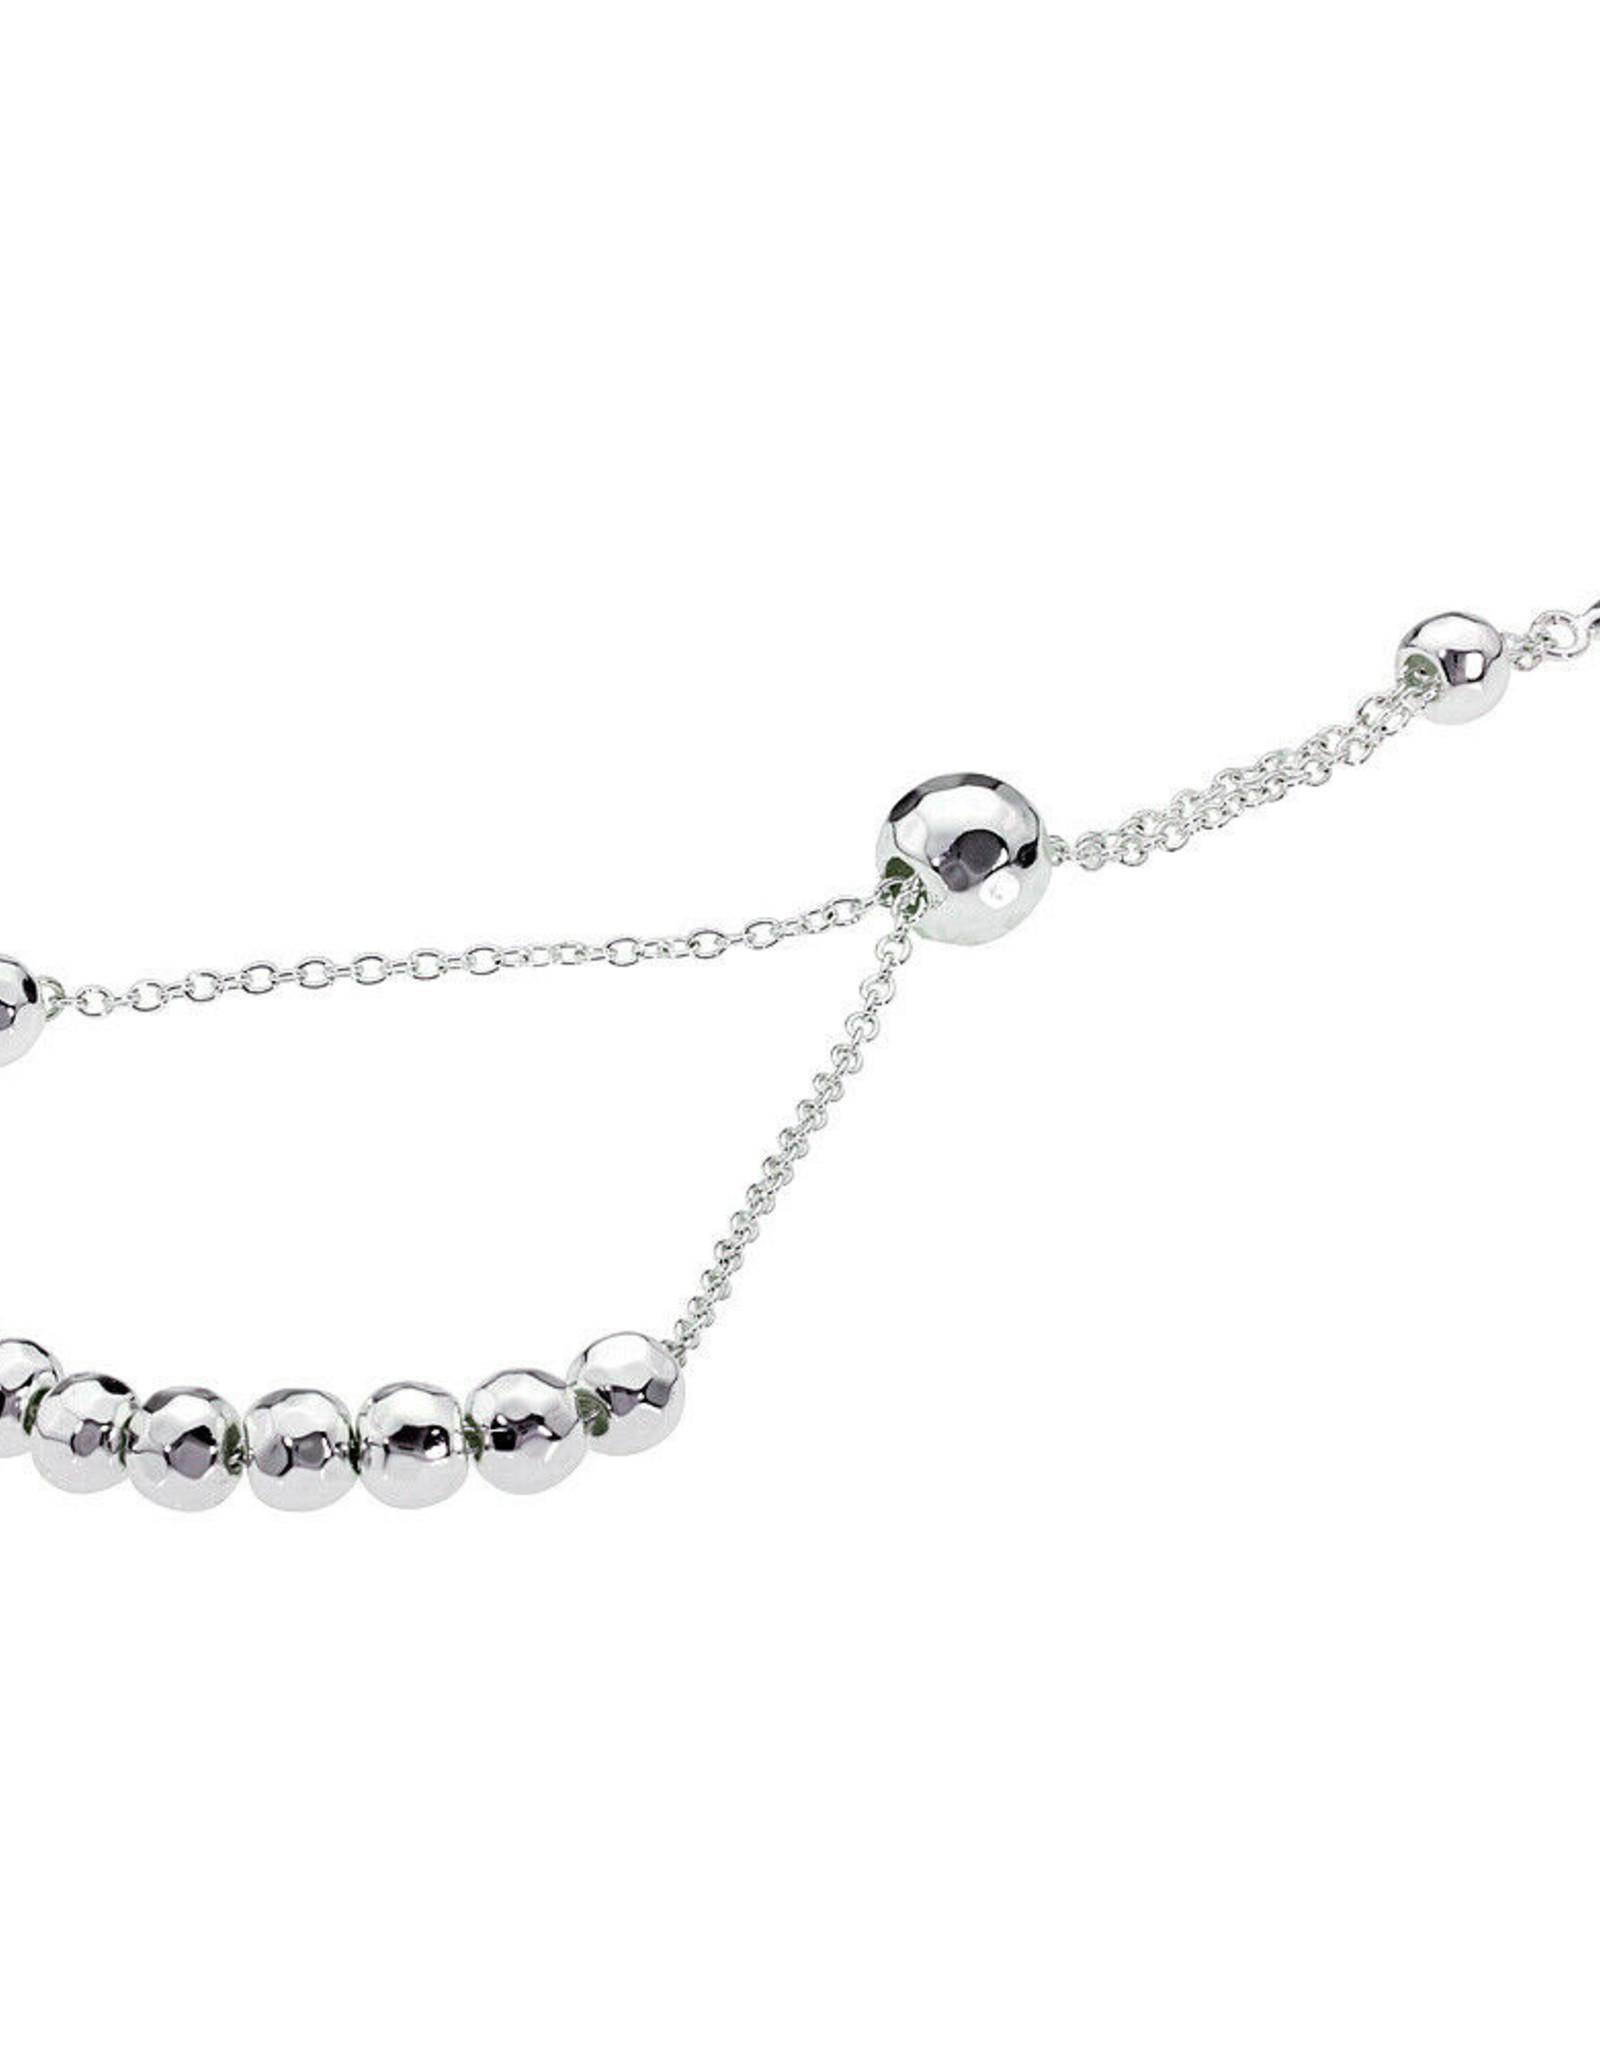 Gorjana Laguna Large Bracelet Adjustable